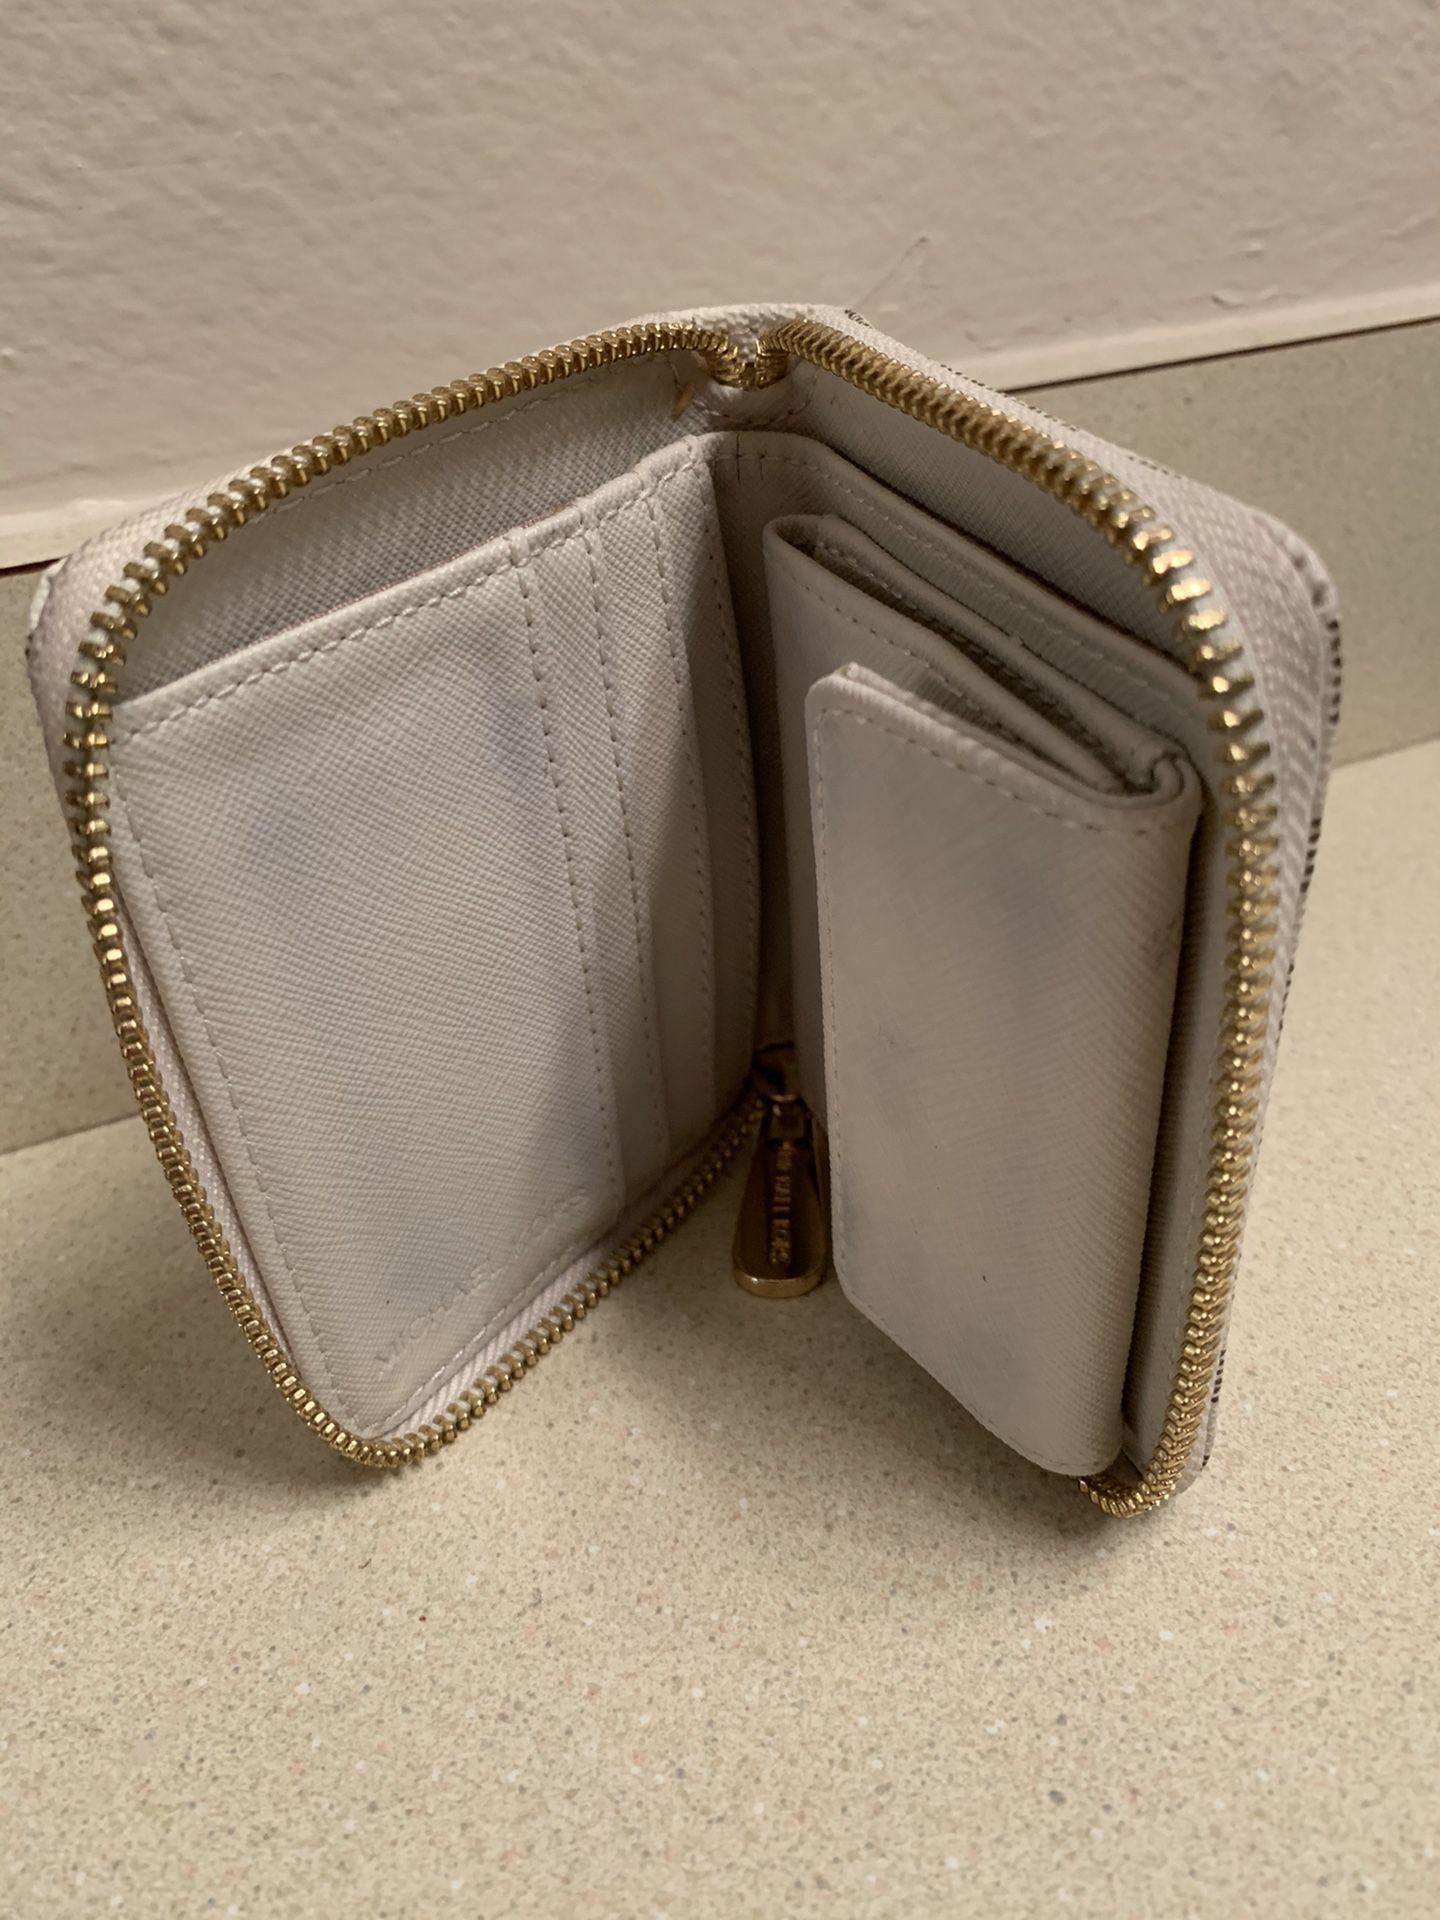 Michael Kors Wallet (Womens)